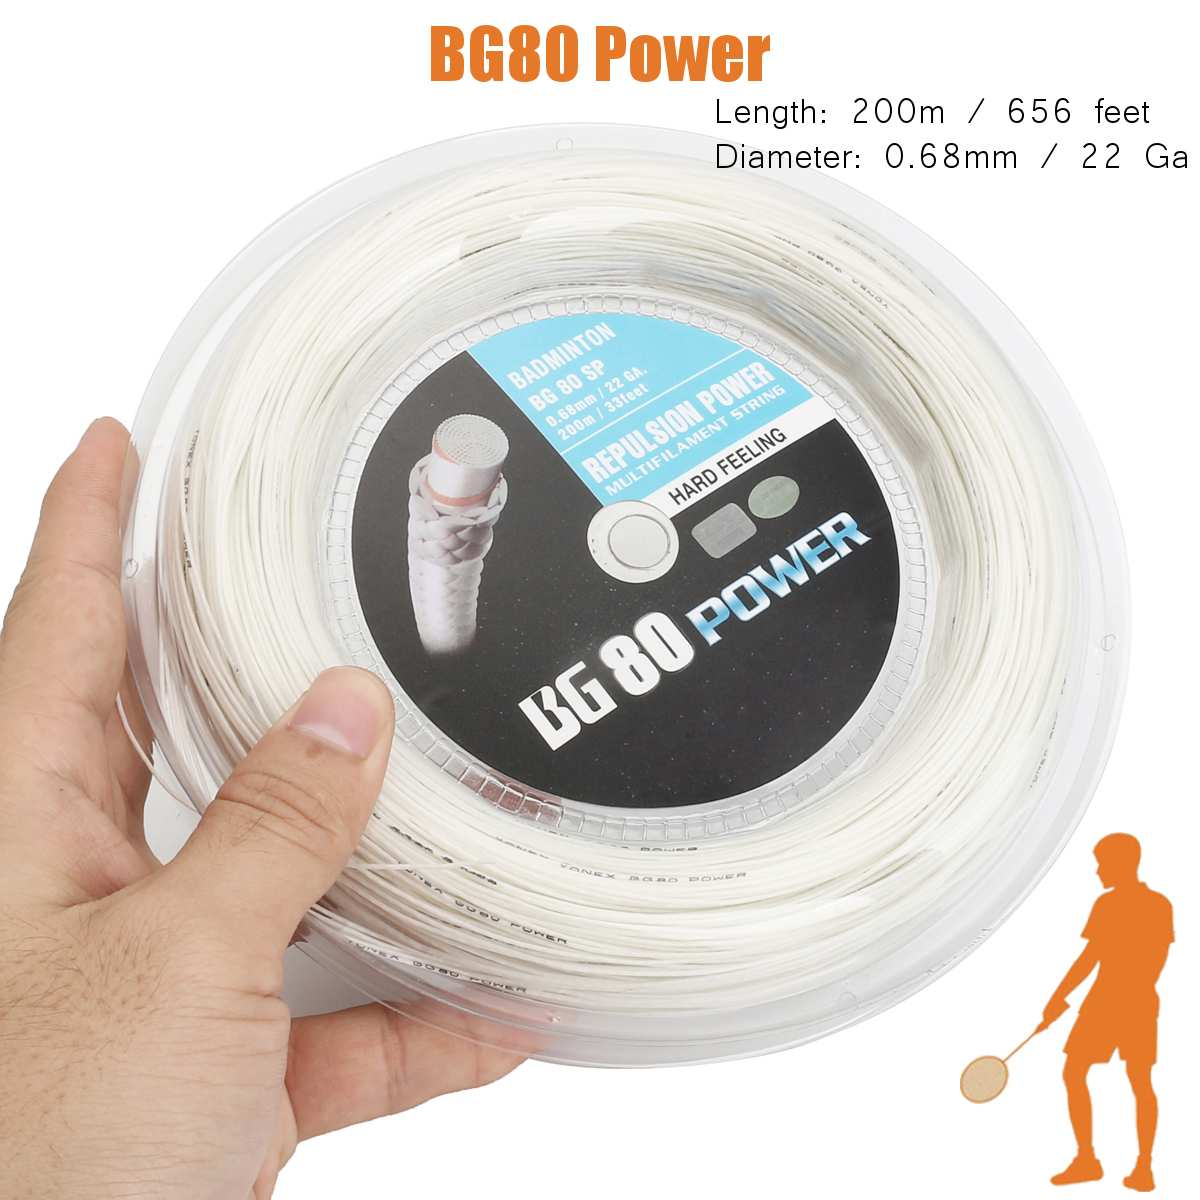 Hard Feeling 200m Long BG80 0.68mm Badminton String Badminton Racket String